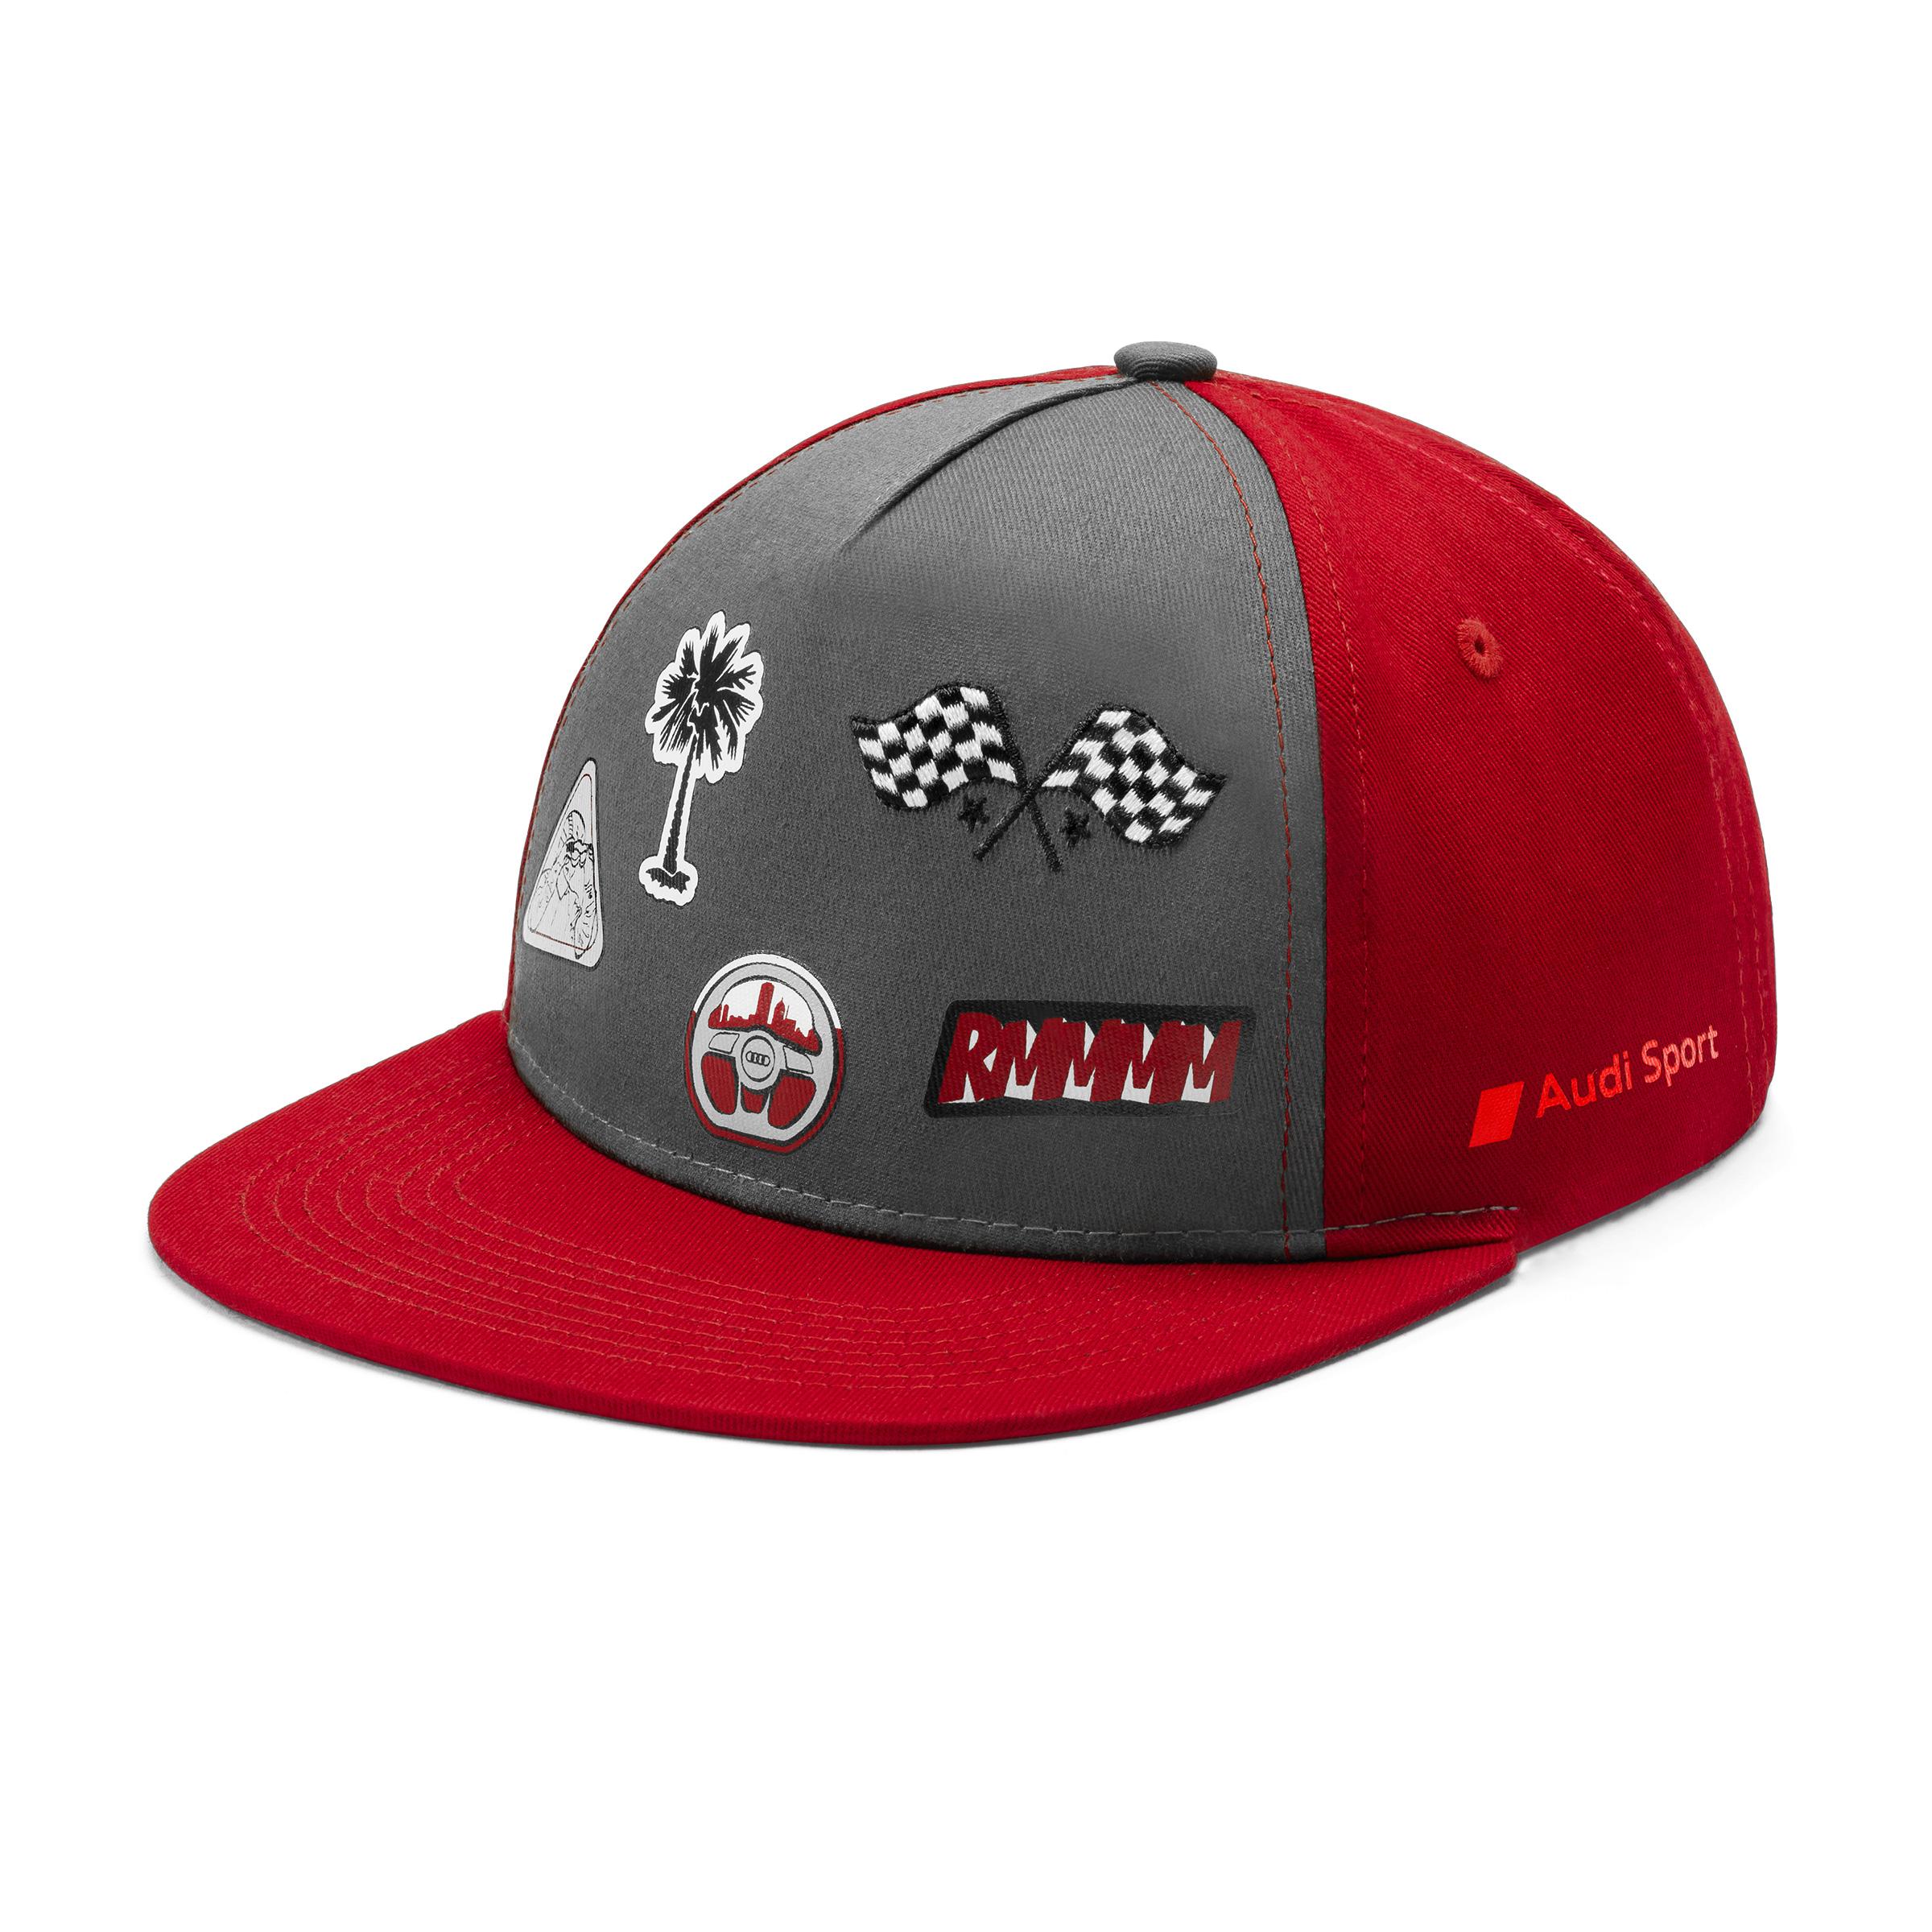 Audi Sport Kleinkinder Cap grau/rot Kappe Basecap